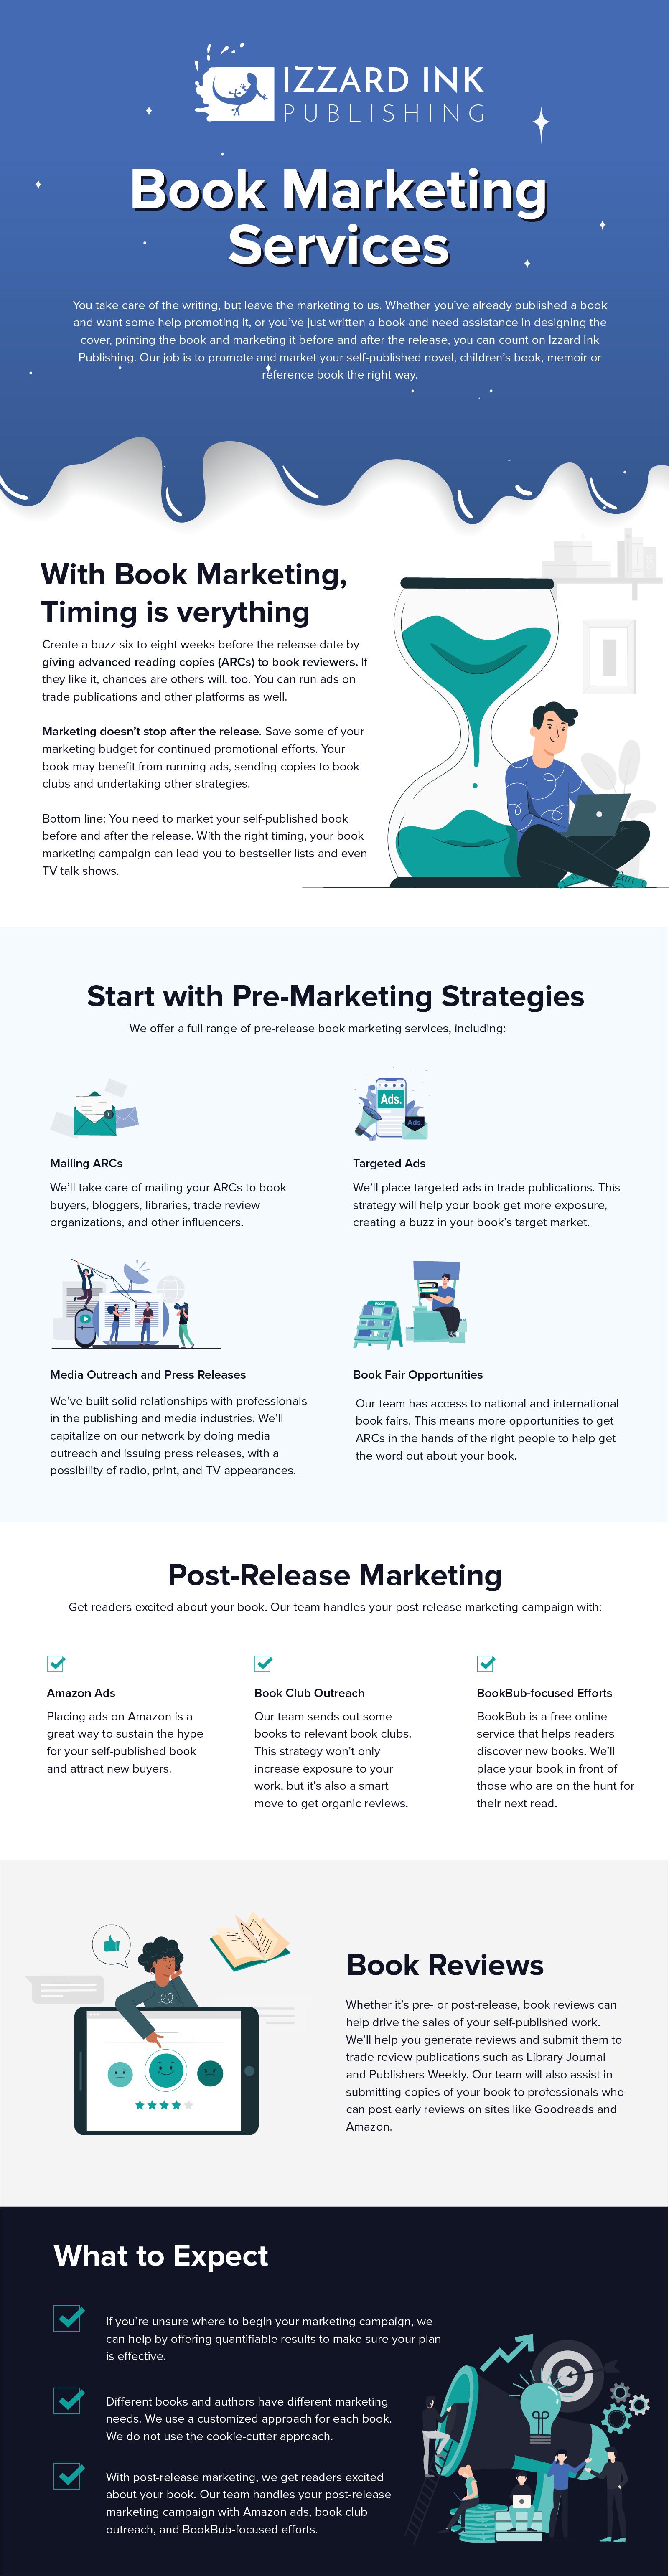 Book Marketing Infographic